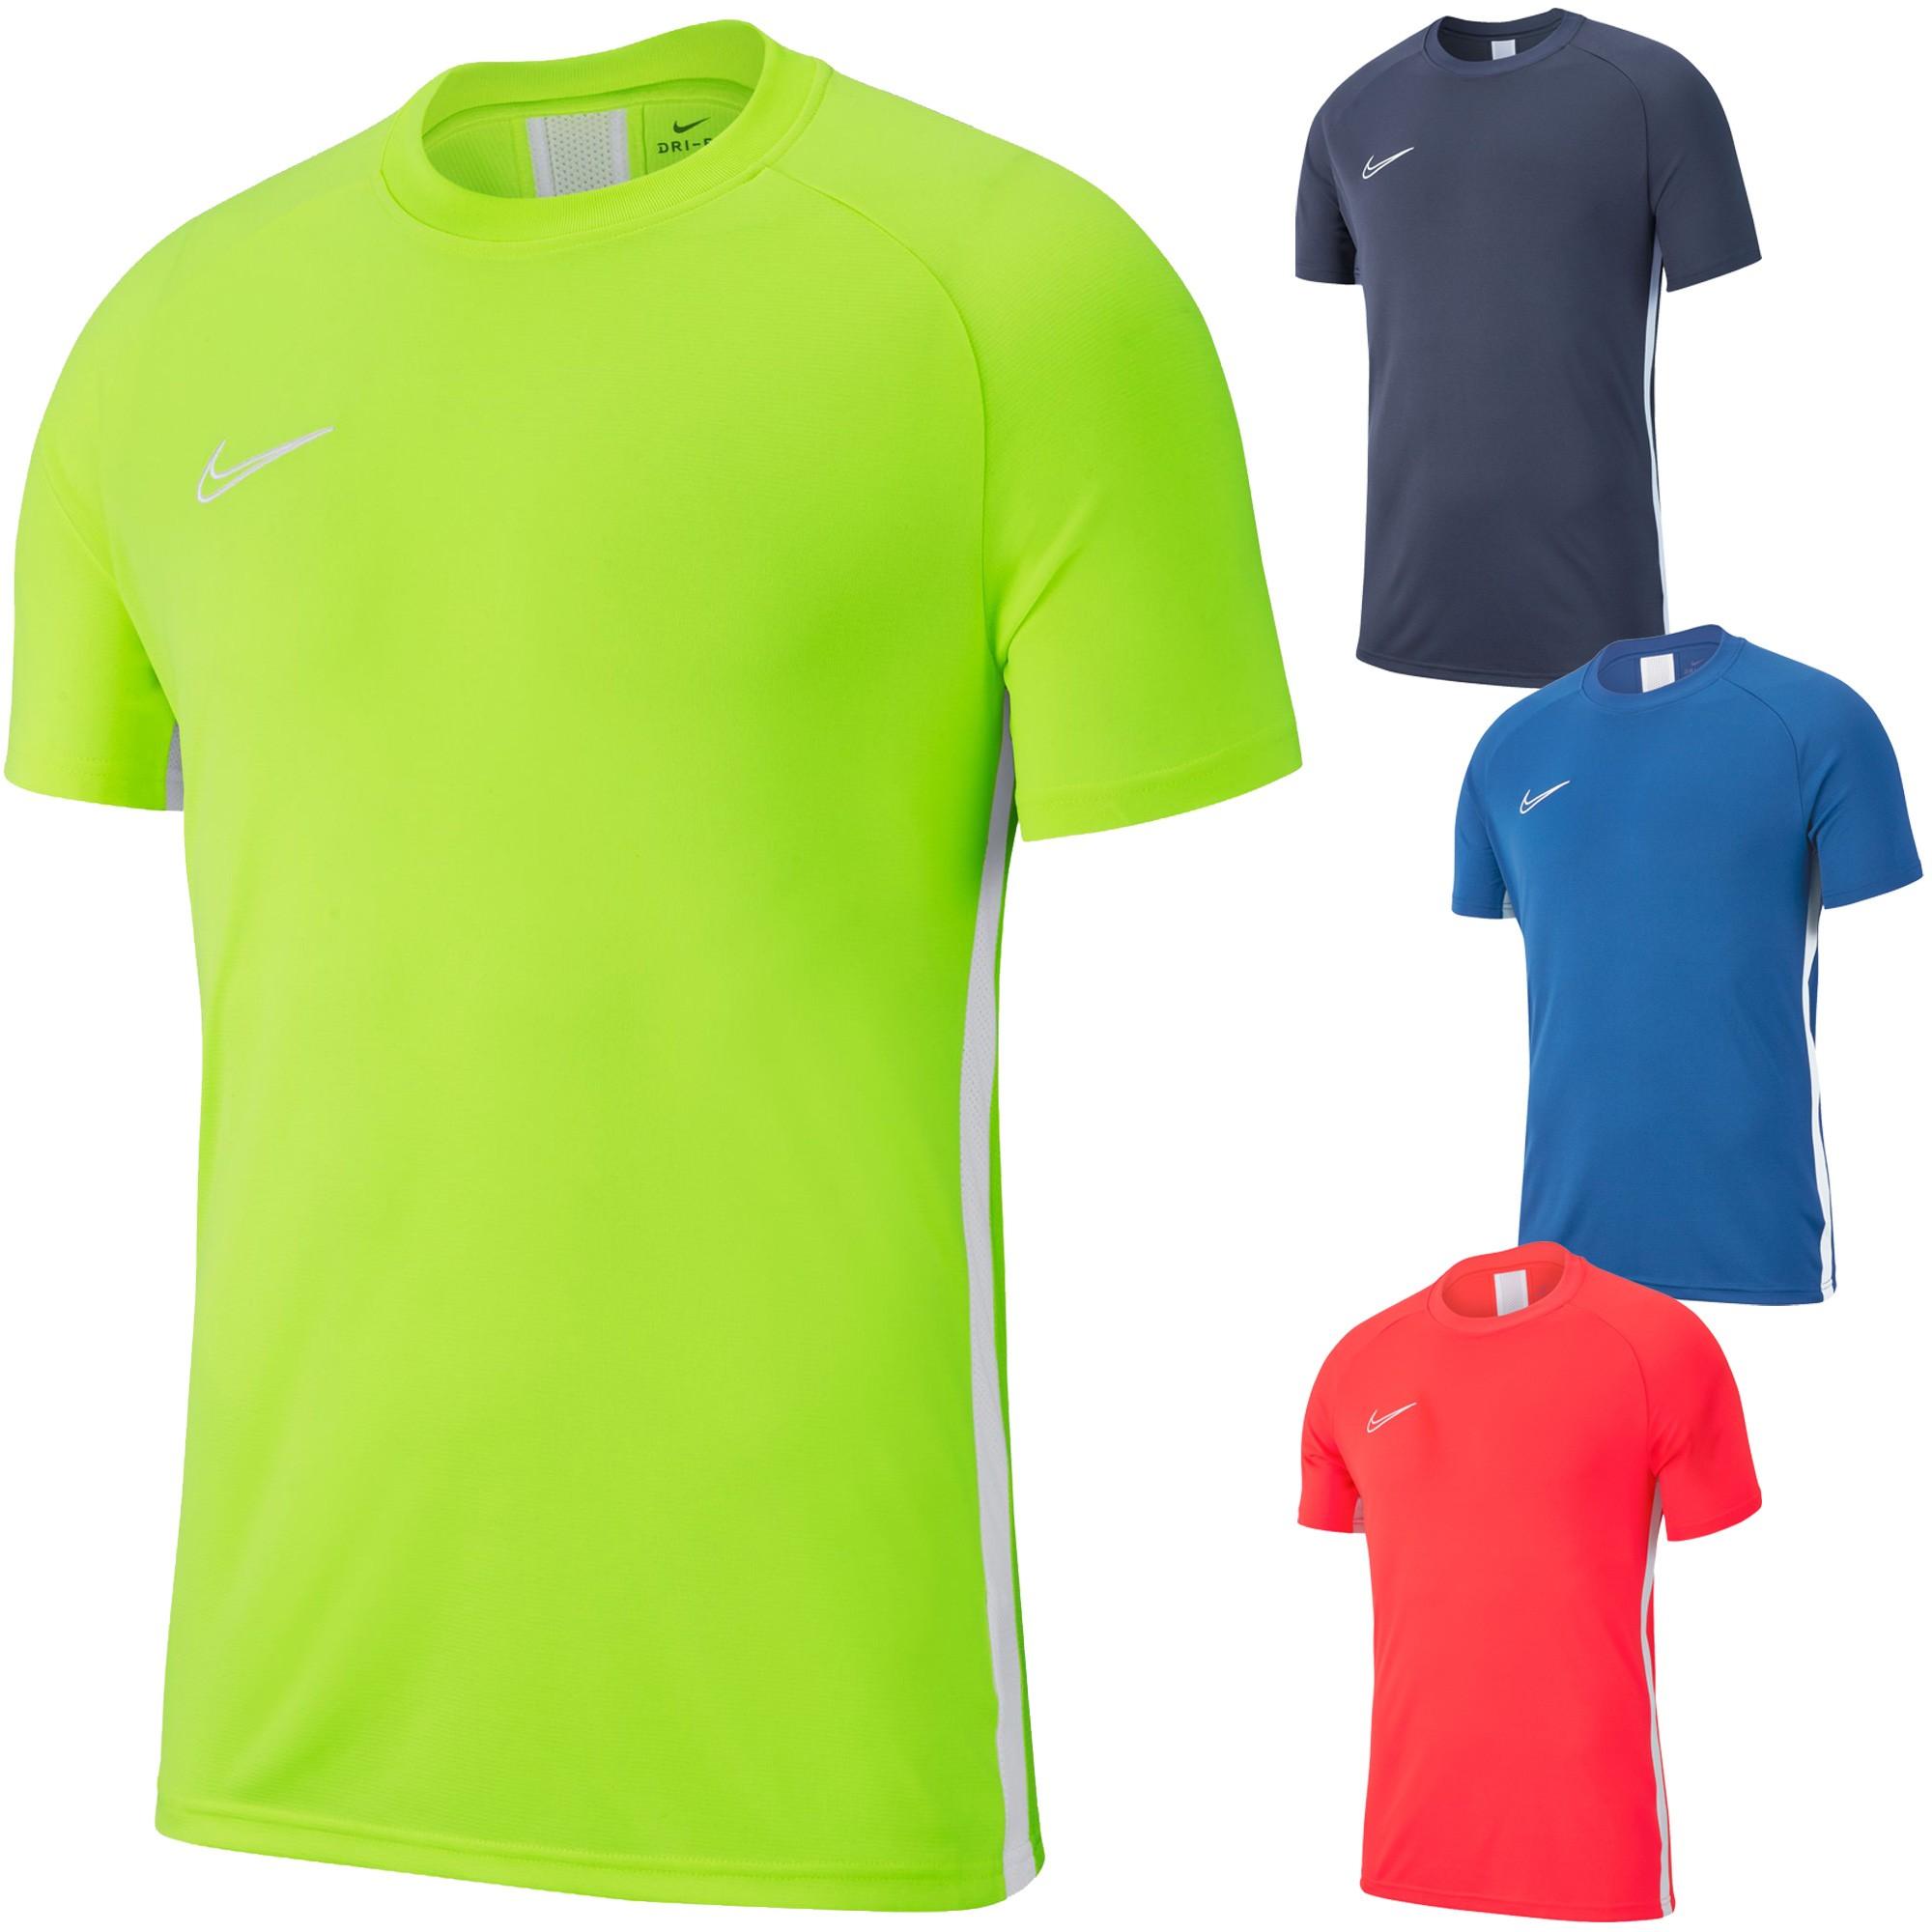 Vêtements Nike Academy19 Training Top Maillot